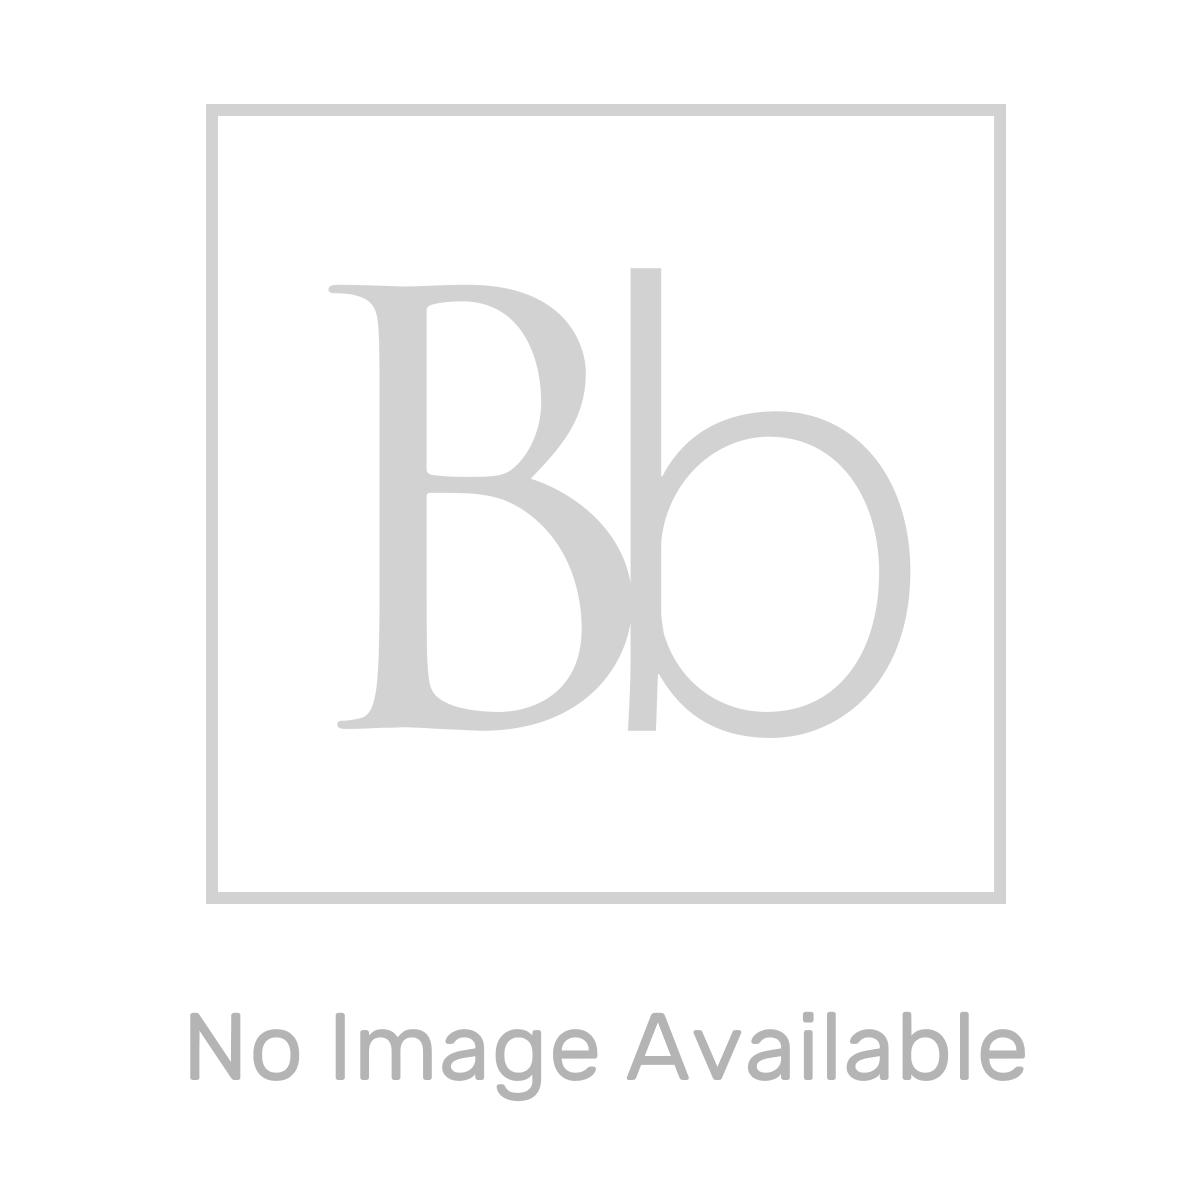 Aquadart Black Slate Shower Tray 1600 x 800 Overhead